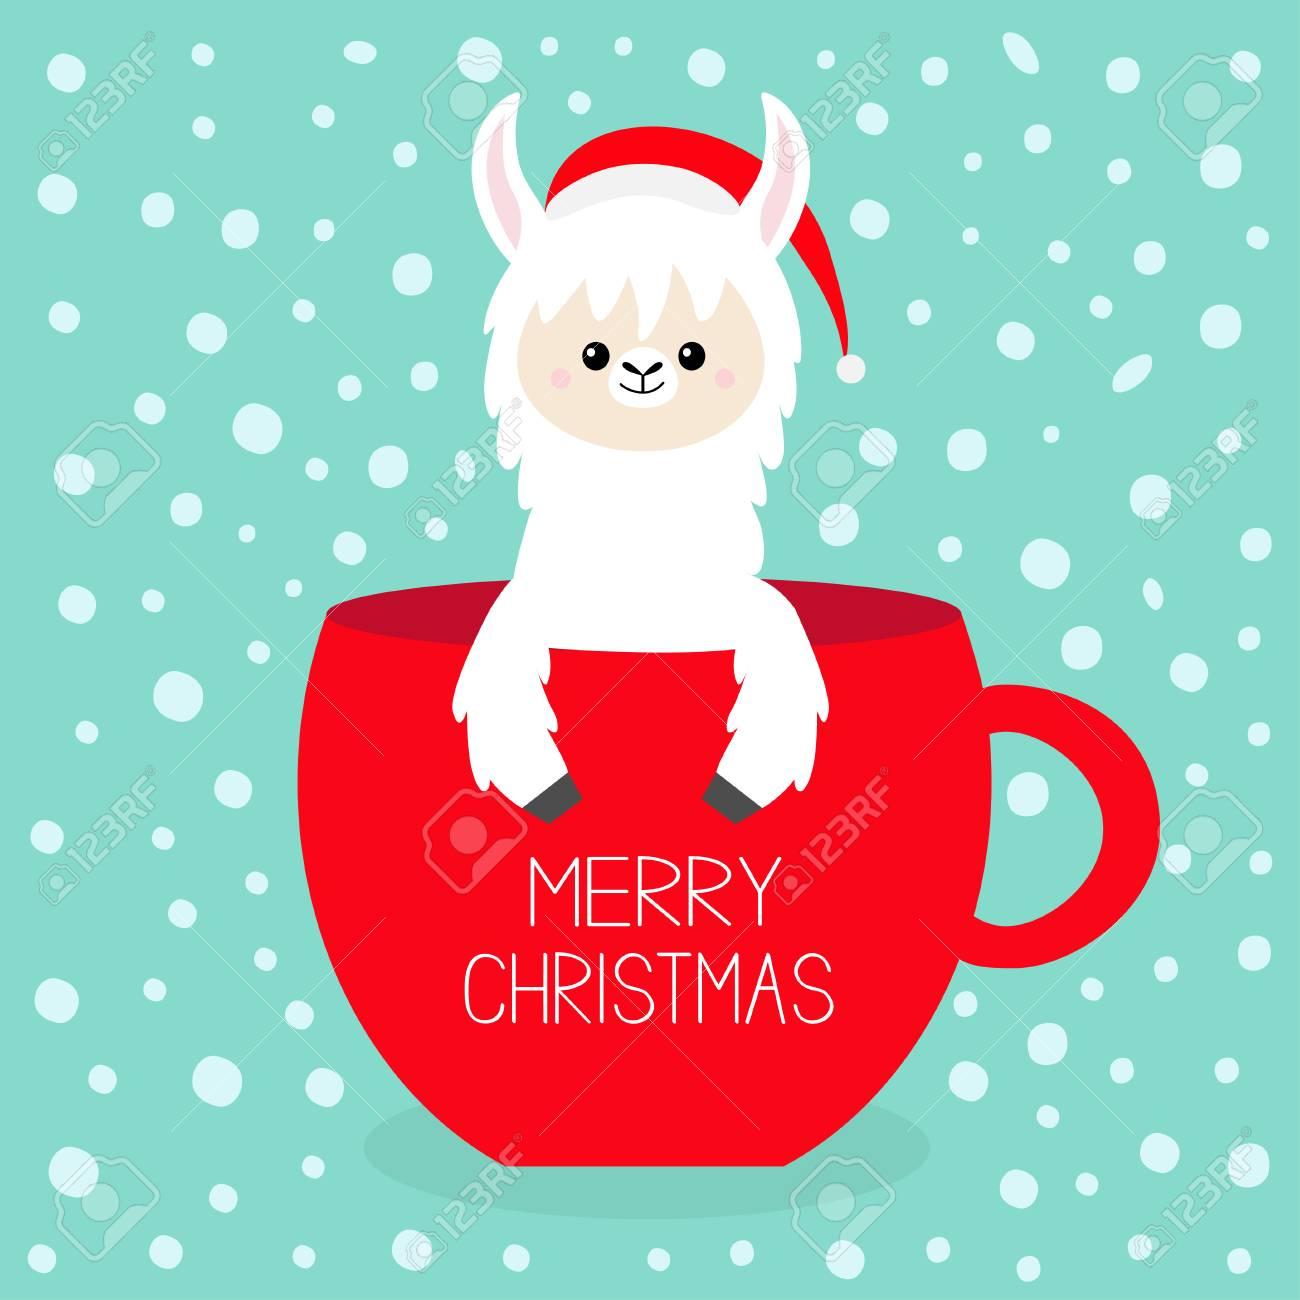 Christmas Llama.Merry Christmas Alpaca Llama Sitting In Coffee Cup Teacup Santa